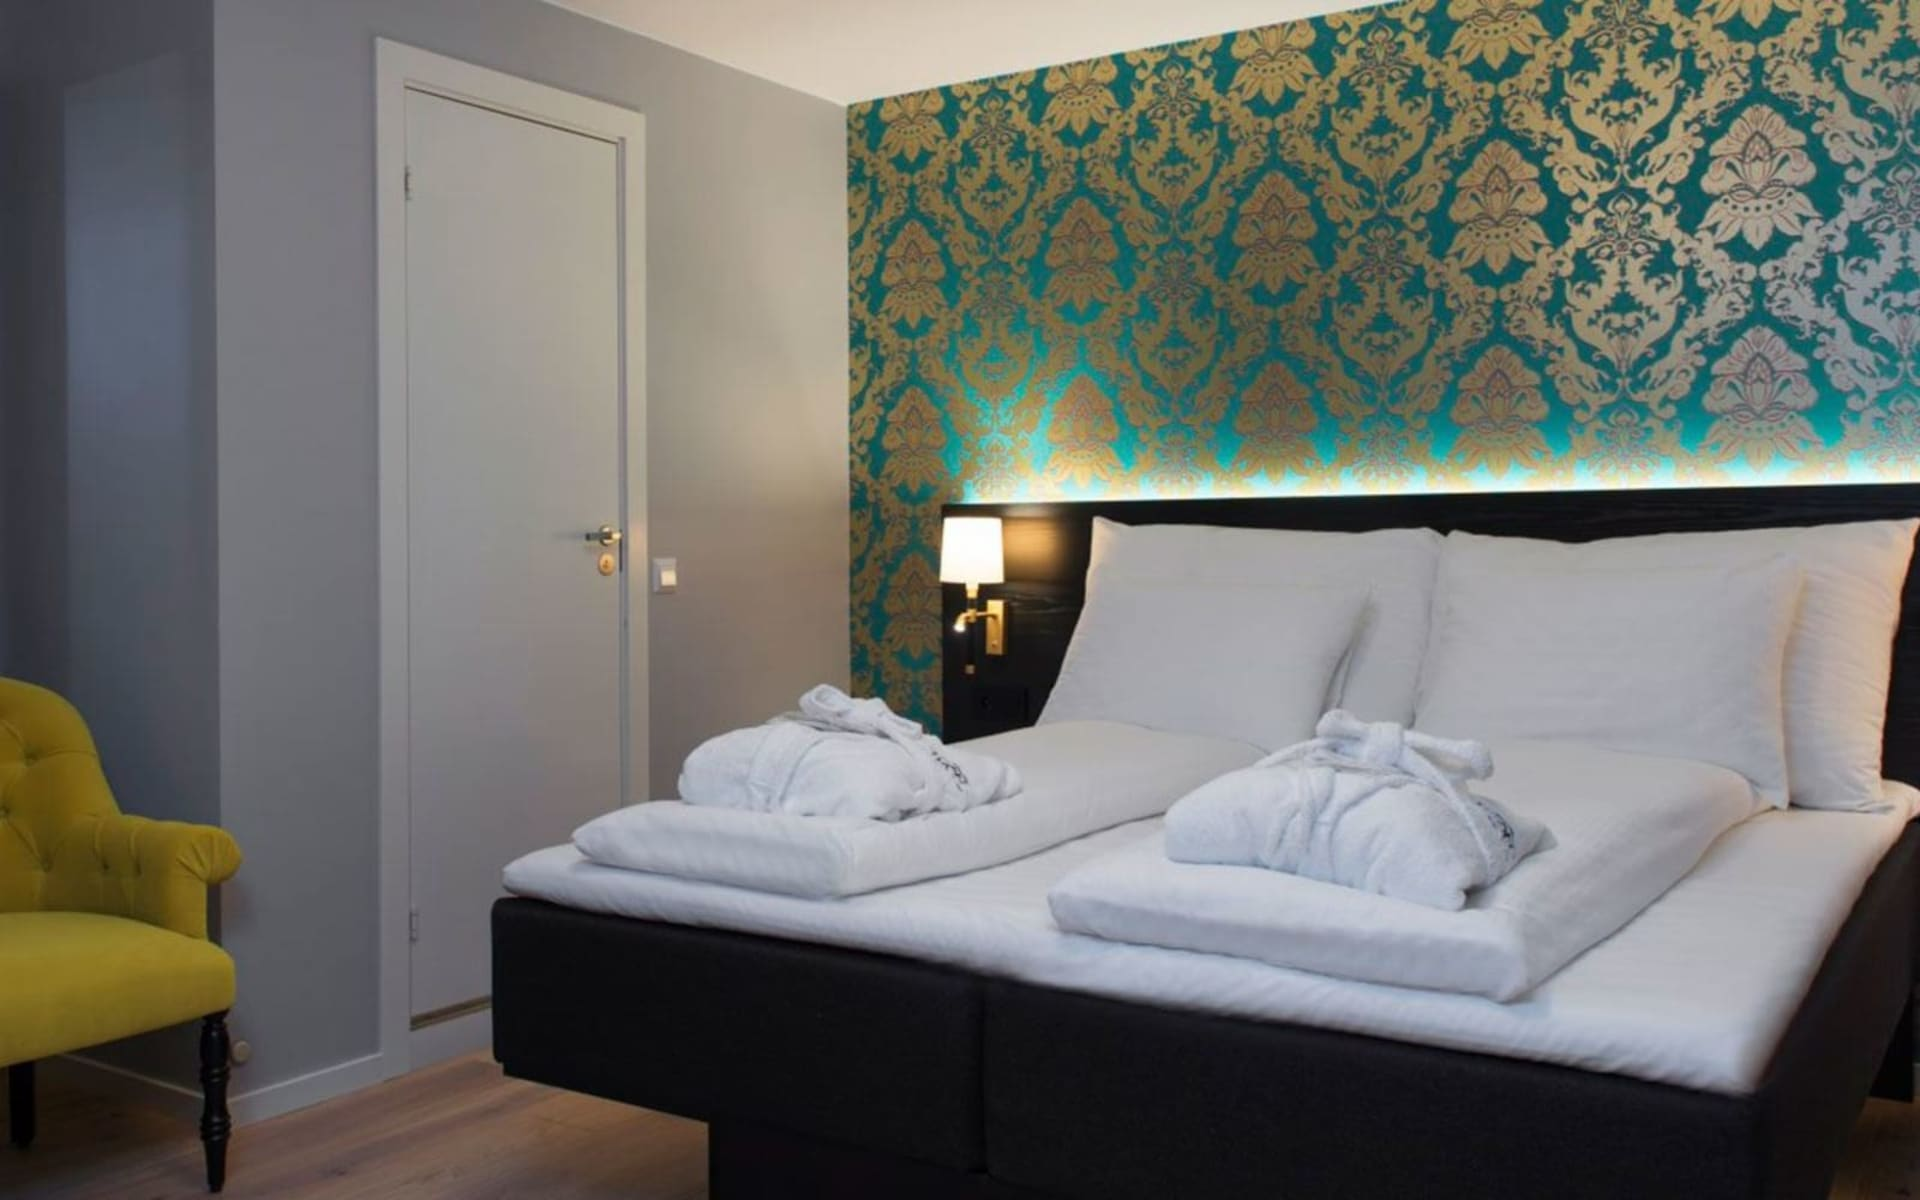 Thon Hotel Rosenkrantz in Bergen: ©Thon Hotels_thon-hotel-rosenkrantz-bergen-standard-room-queen-2